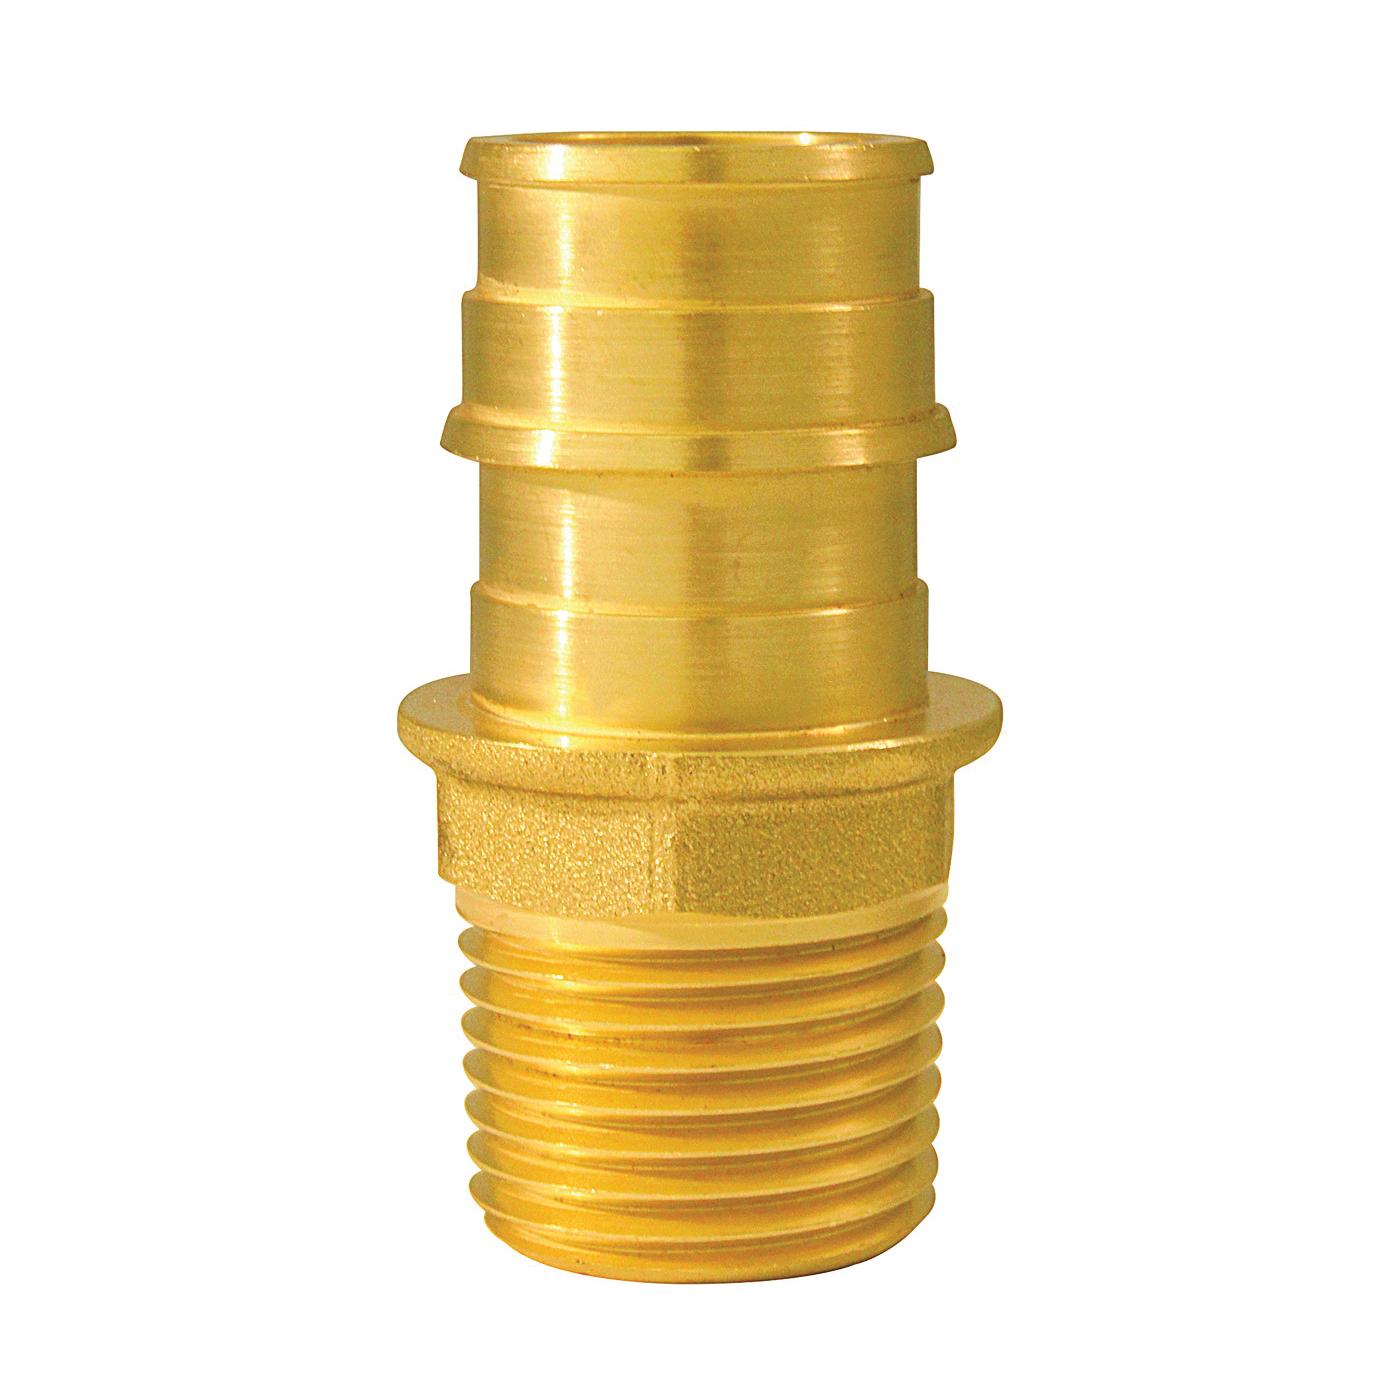 Picture of Apollo ExpansionPEX EPXMA3412 Pipe Adapter, 3/4 x 1/2 in, Barb x MPT, Brass, 200 psi Pressure